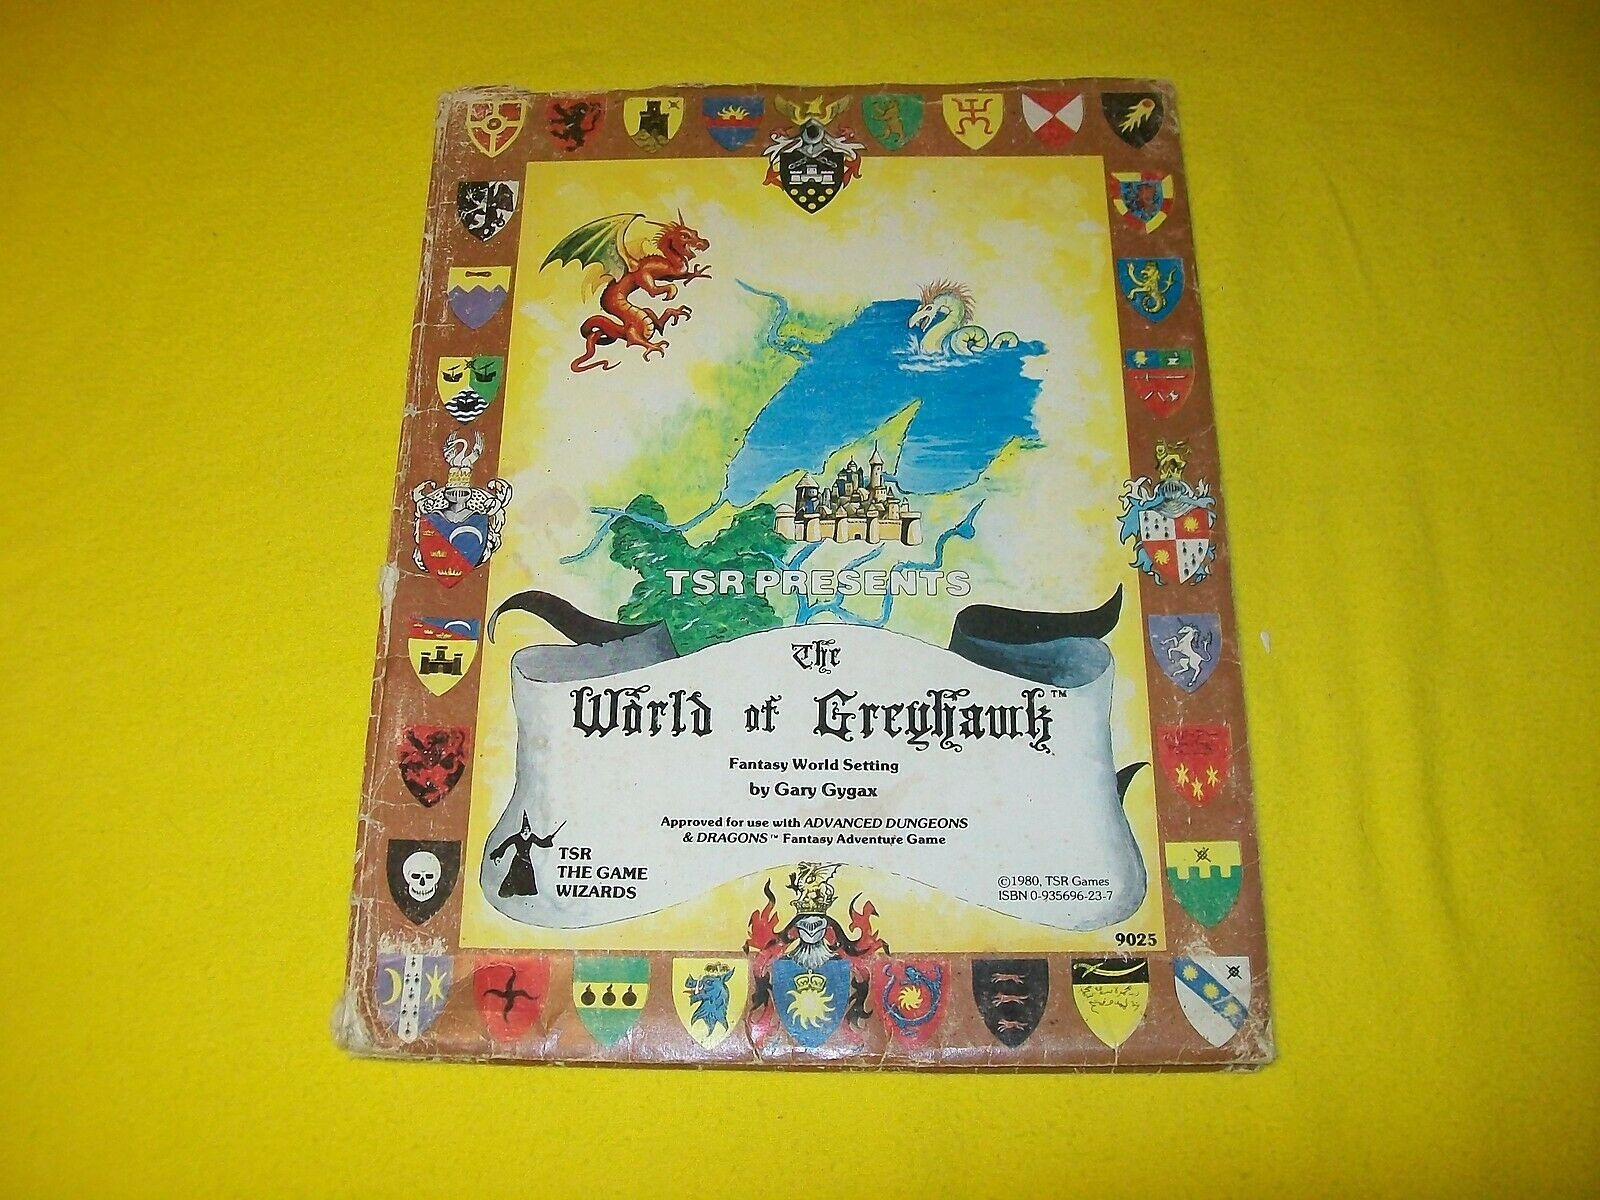 THE WORLD OF GREYHAWK FANTASY WORLD SETTING FOLIO DUNGEONS & DRAGONS AD&D 9025 8